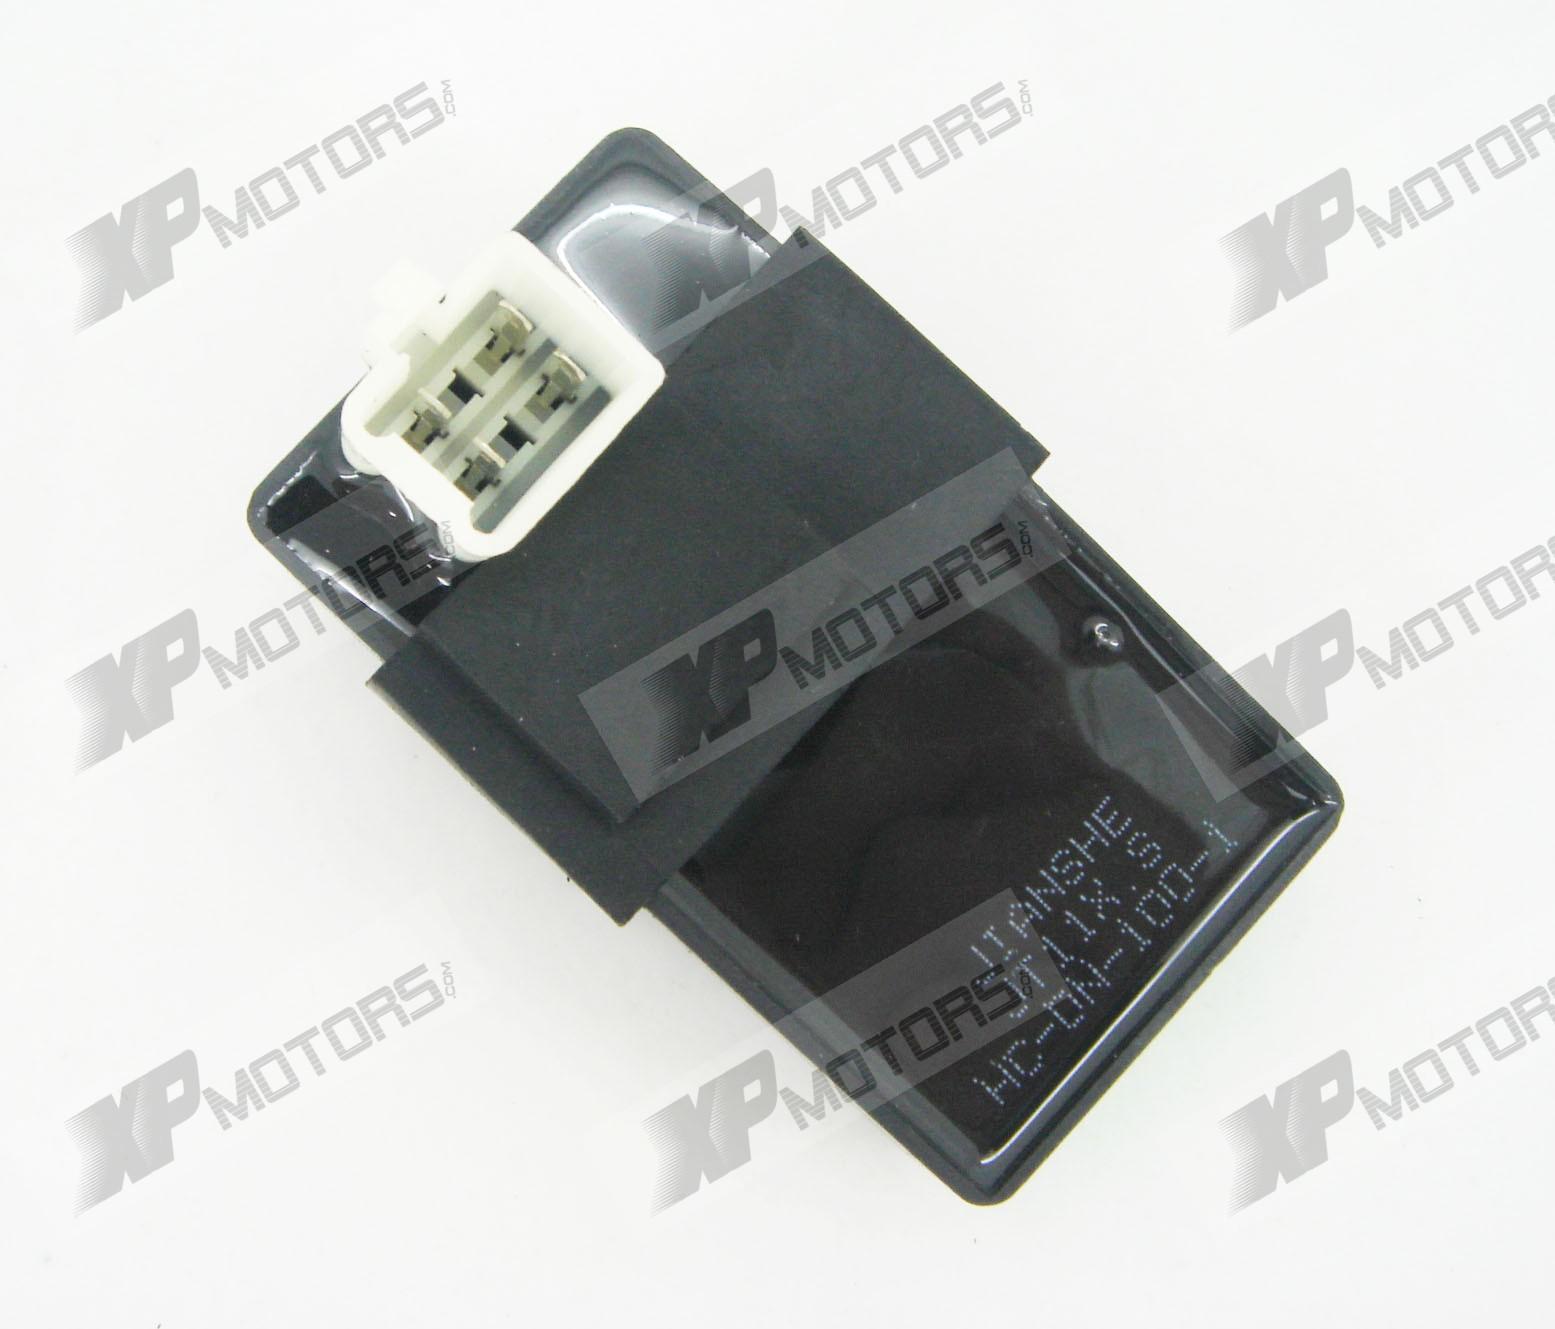 Honda 6 Pin Cdi Wiring Diagram | Wiring Liry on